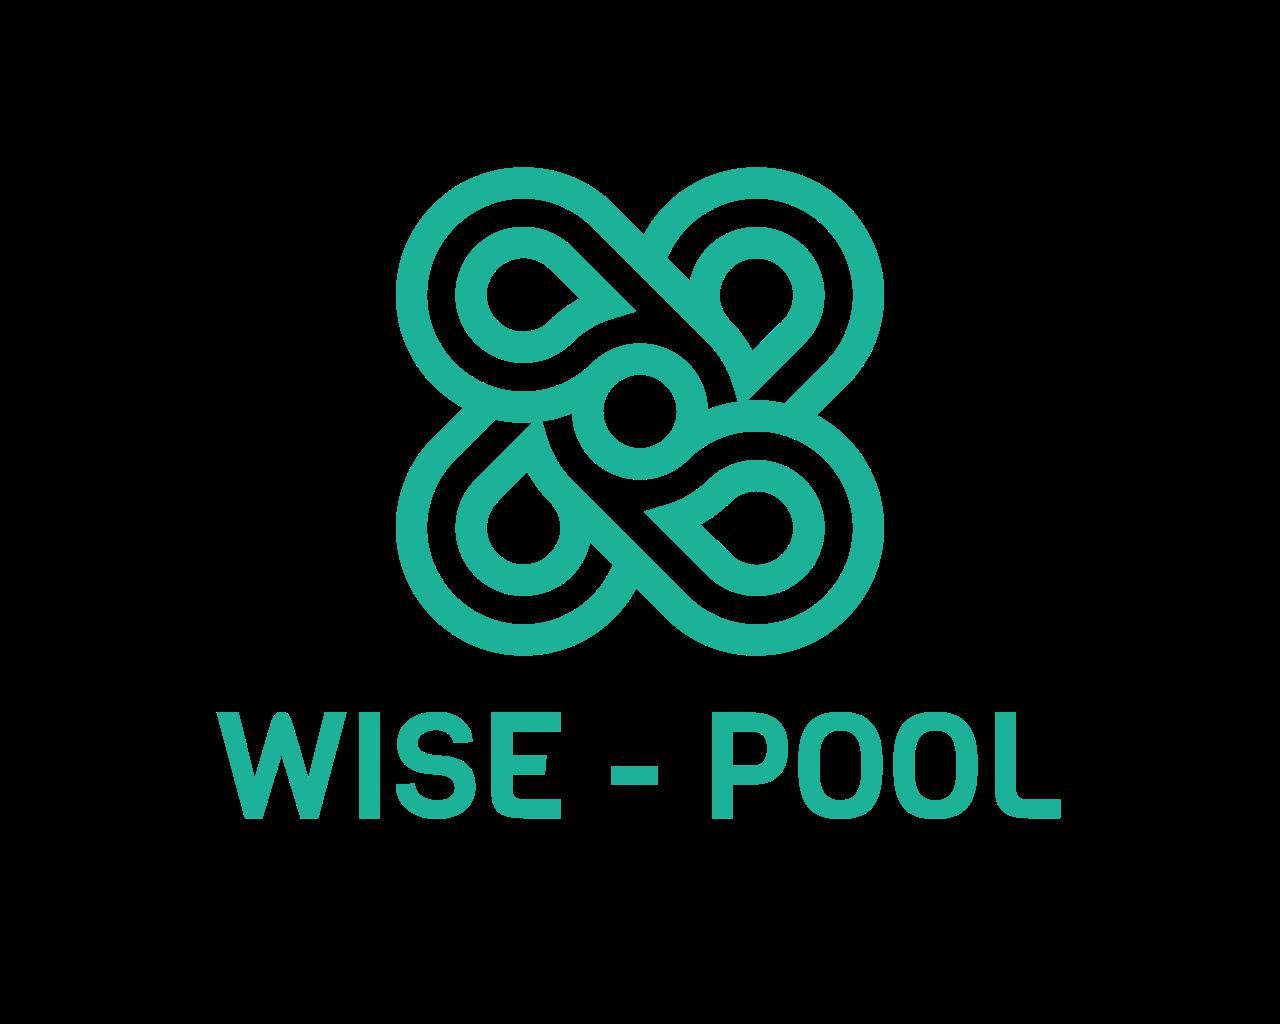 cardano_stake_pool_wise